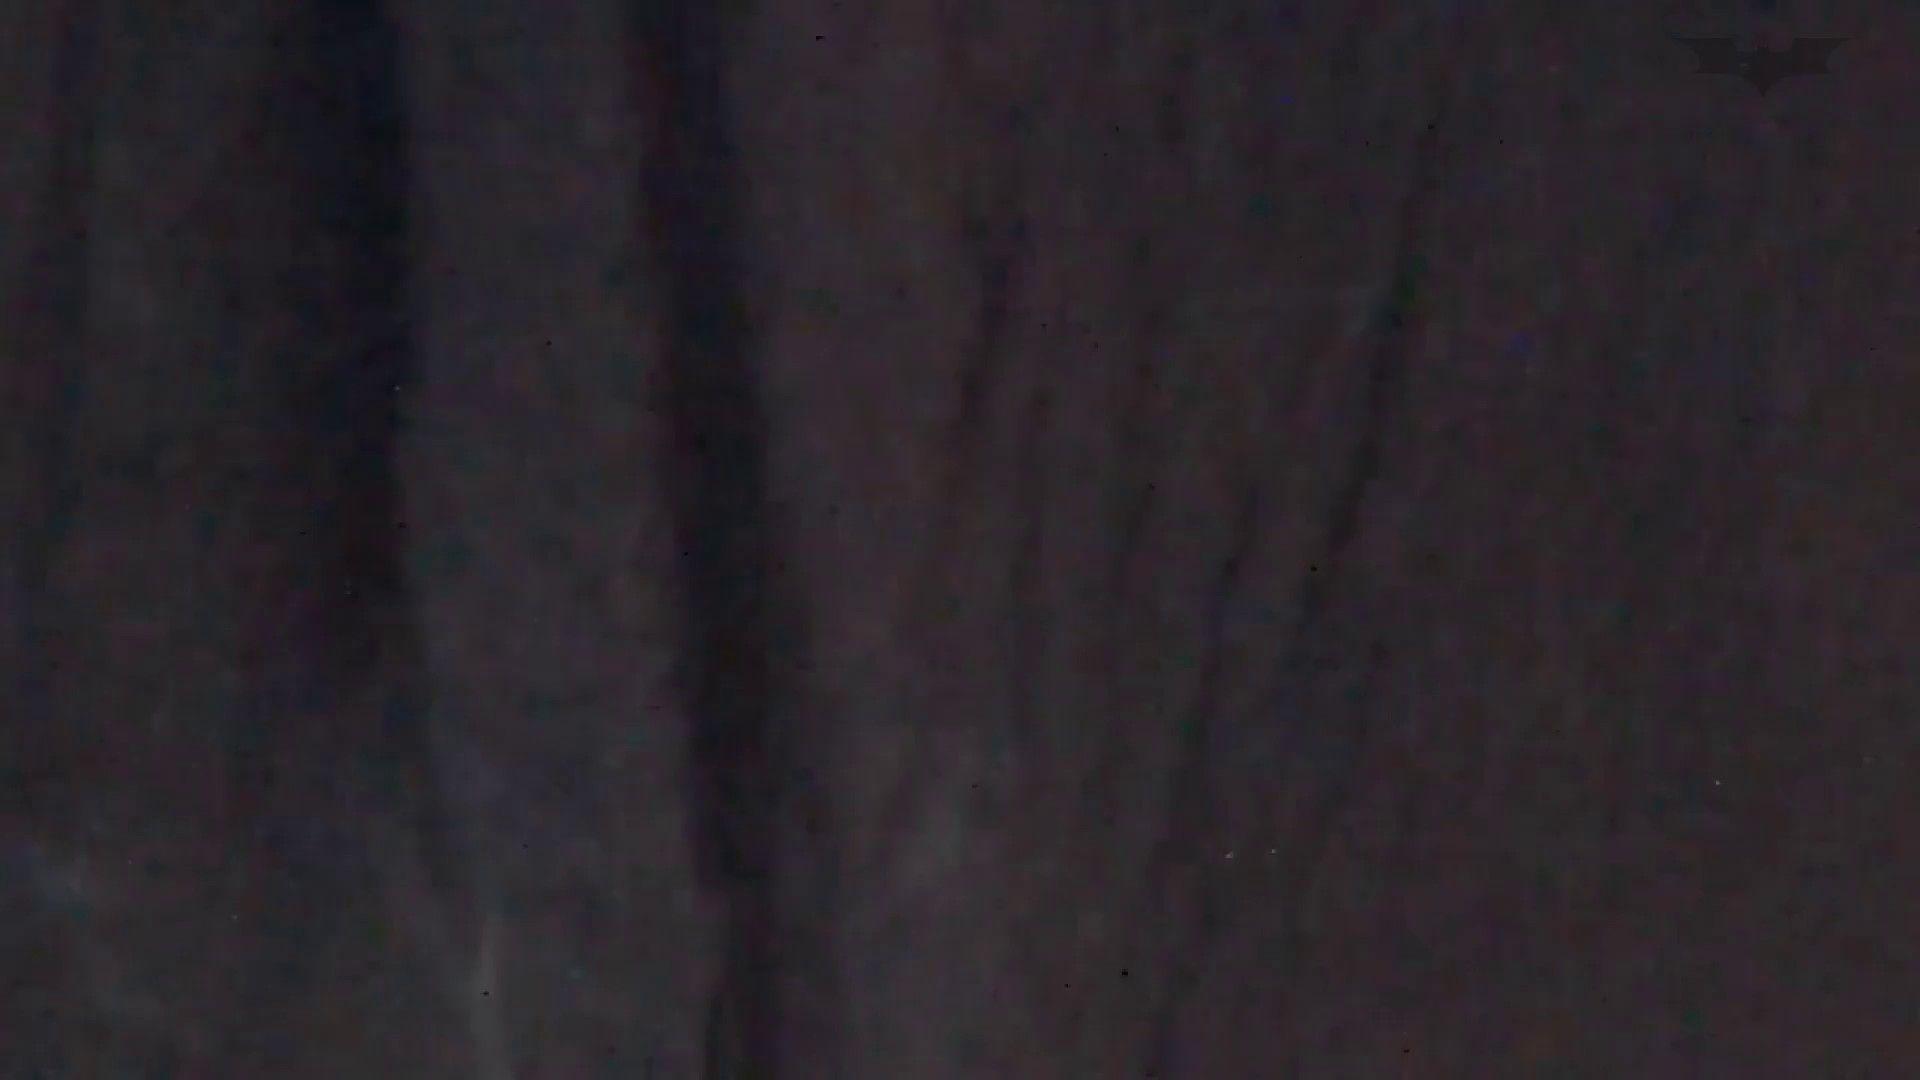 JD盗撮 美女の洗面所の秘密 Vol.61 洗面所 ワレメ動画紹介 103連発 29